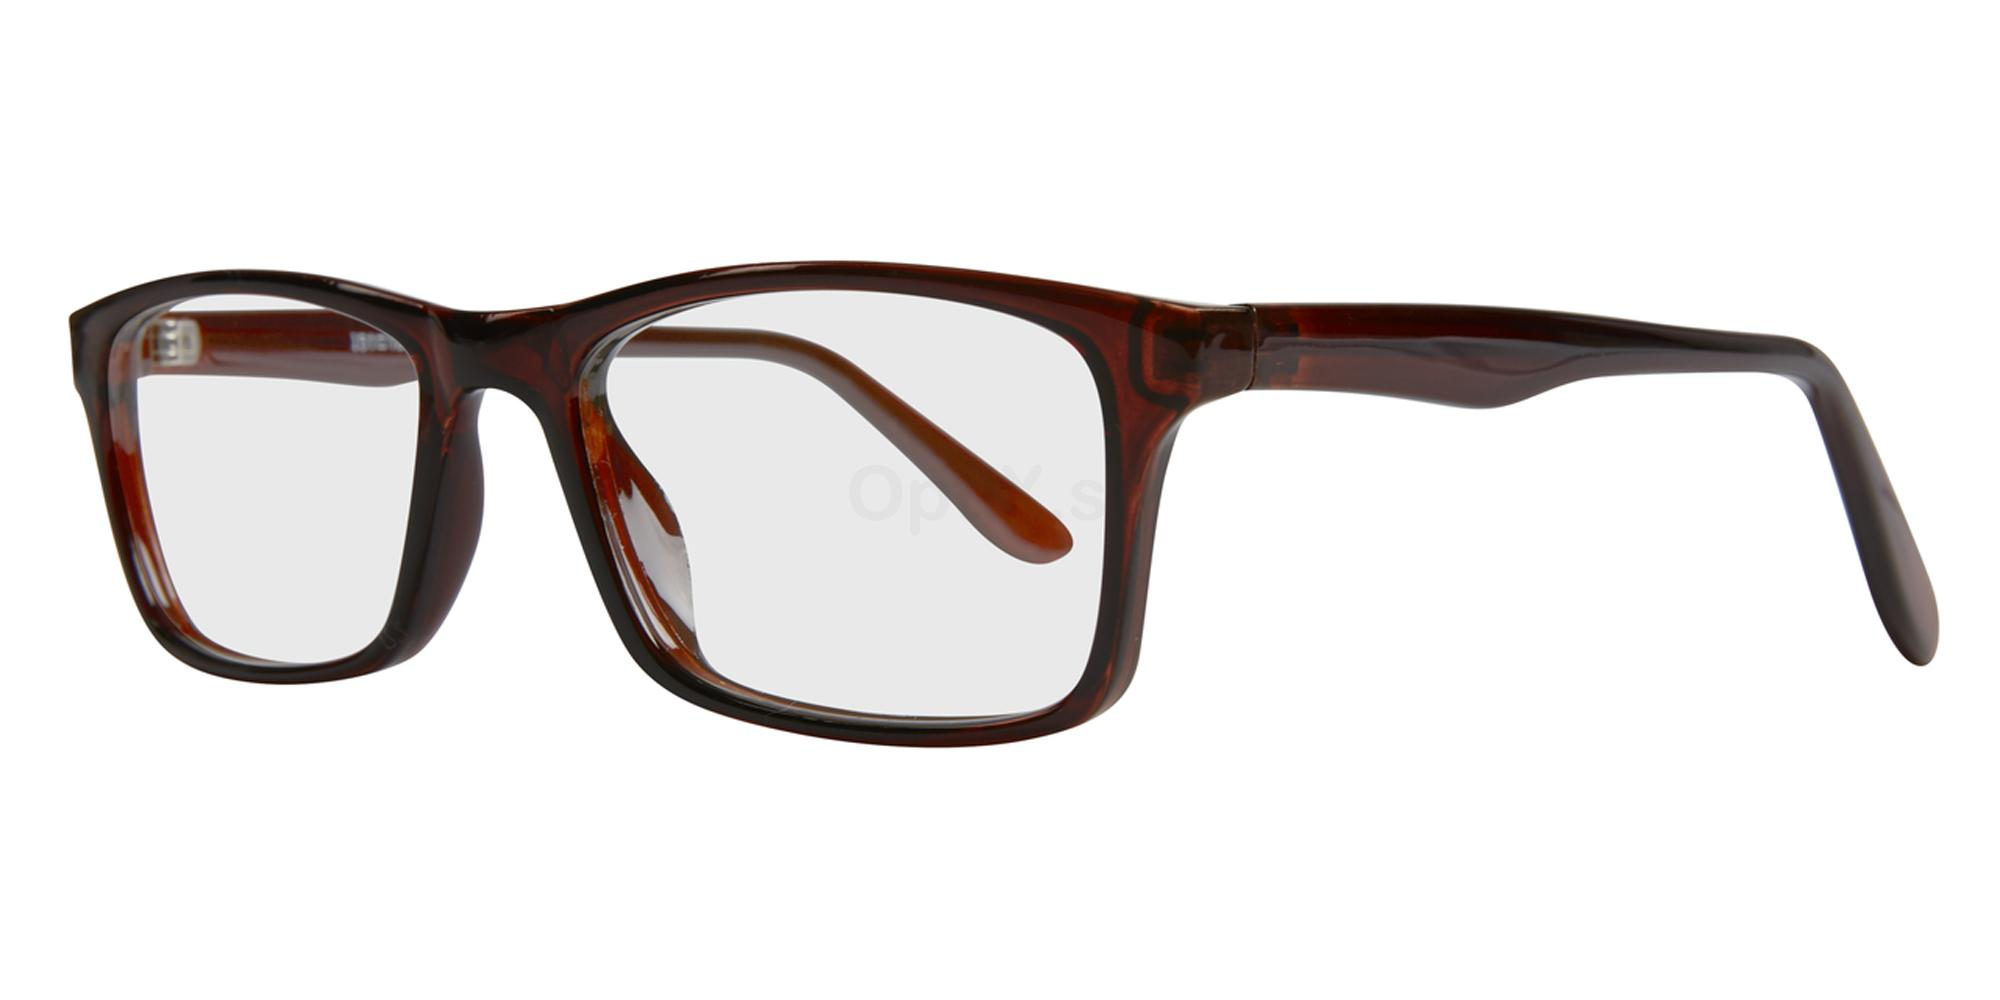 C1 Complete 2 Mod 11 Glasses, Complete